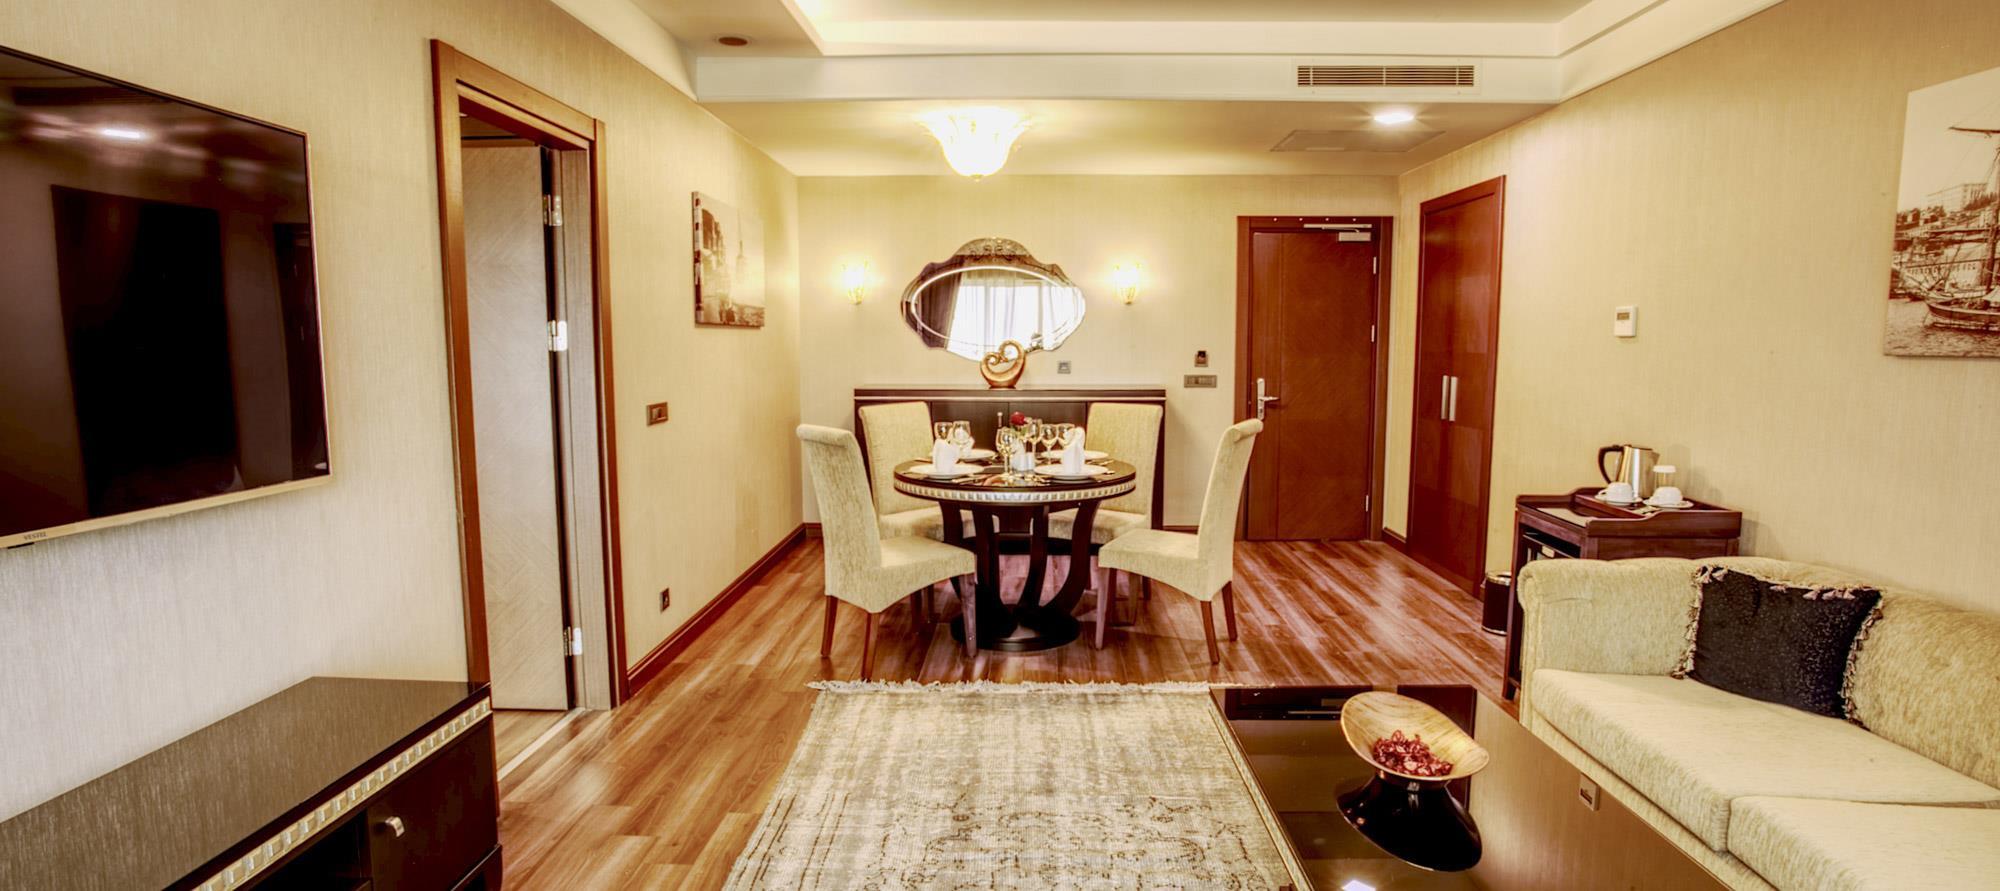 Grand Makel Hotel Topkapi254609